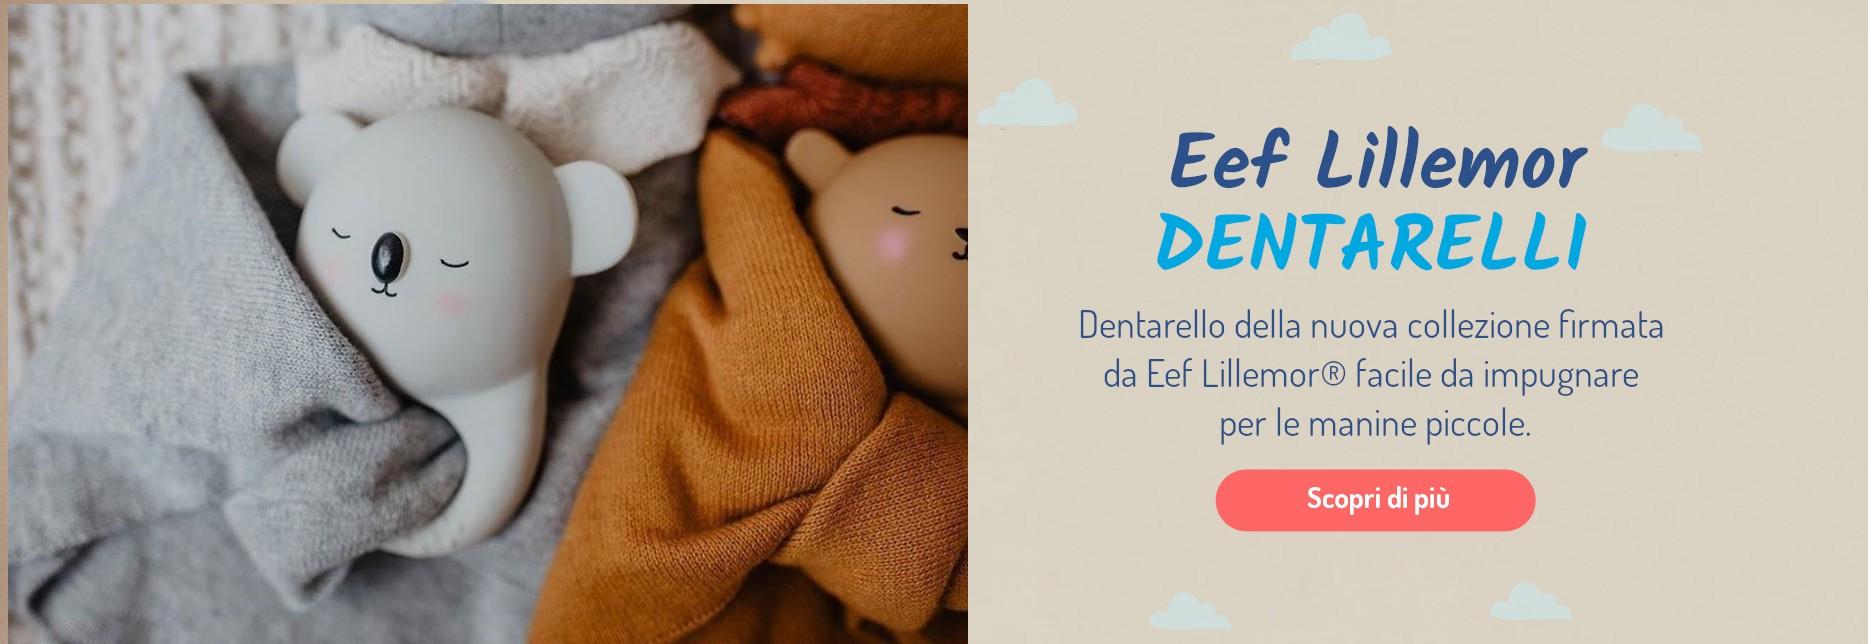 Dentarelli Eef Lillemor